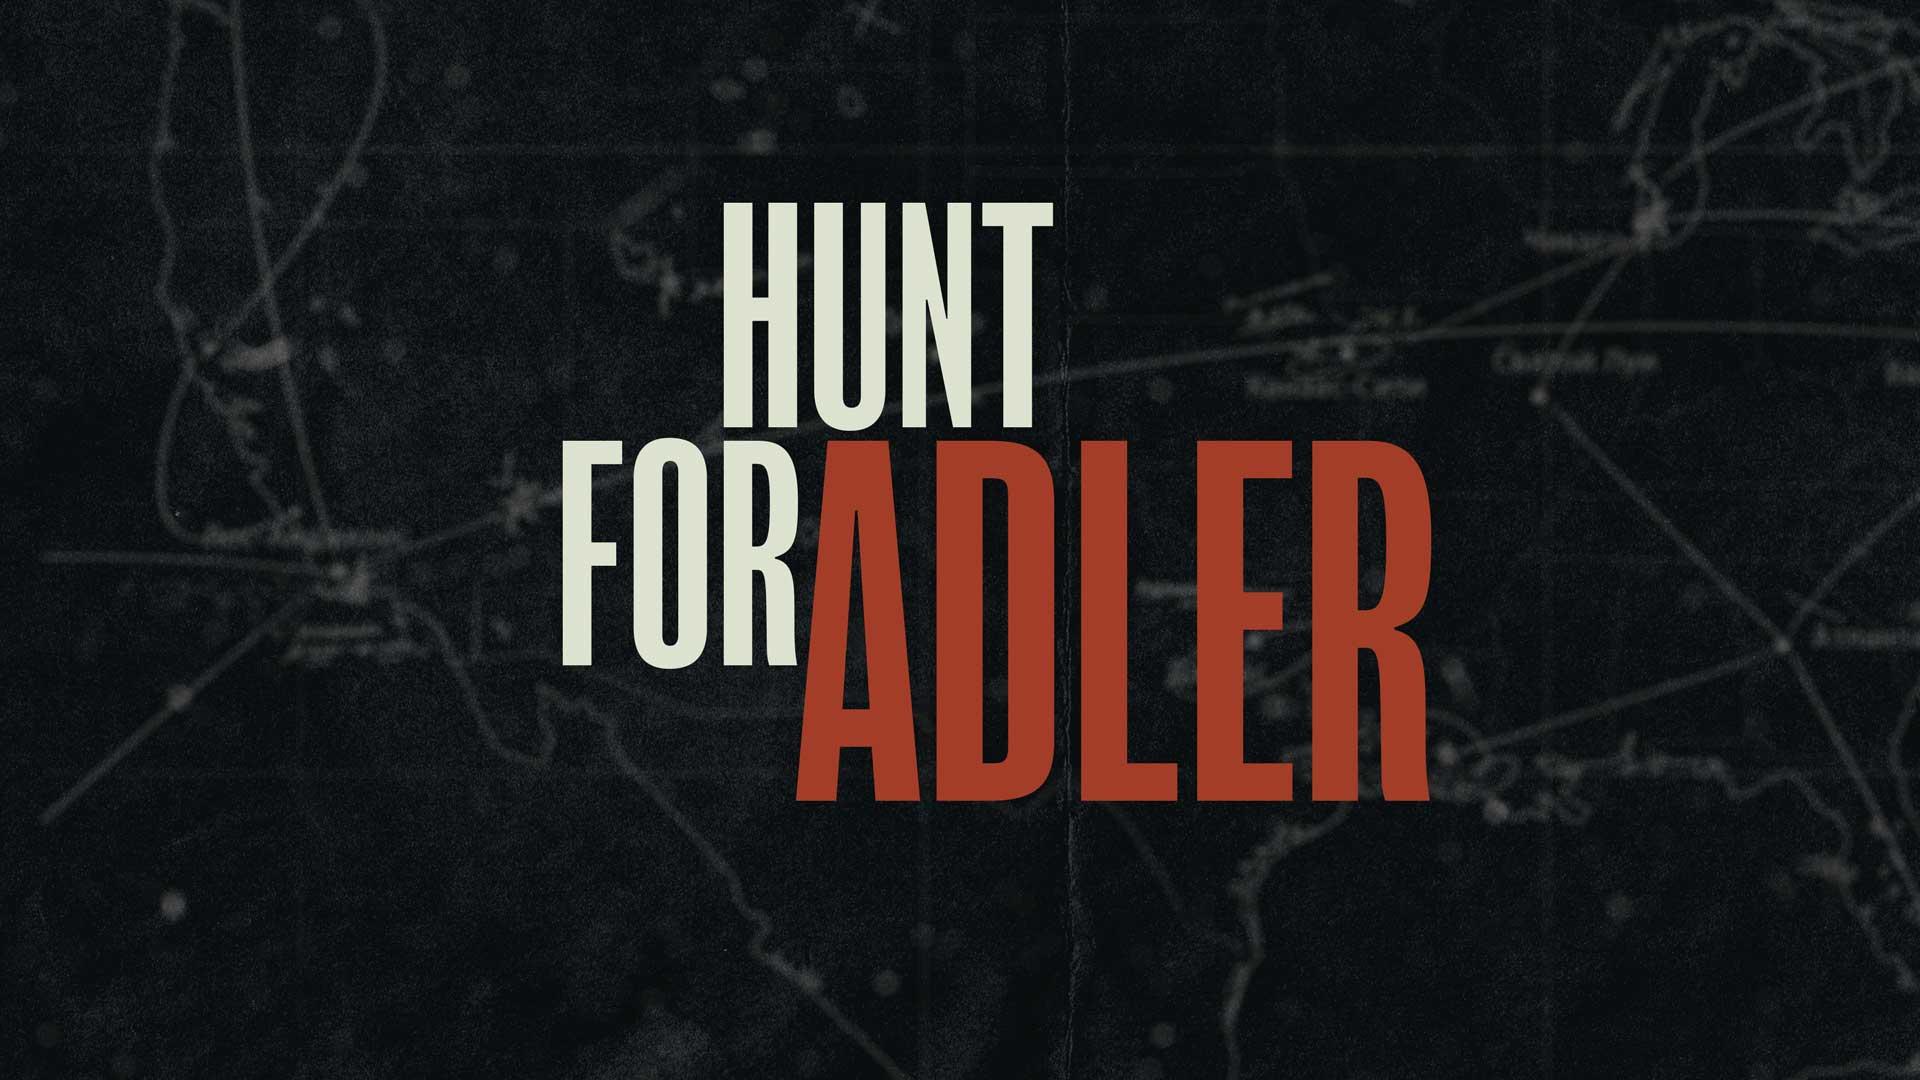 hunt for adlier event